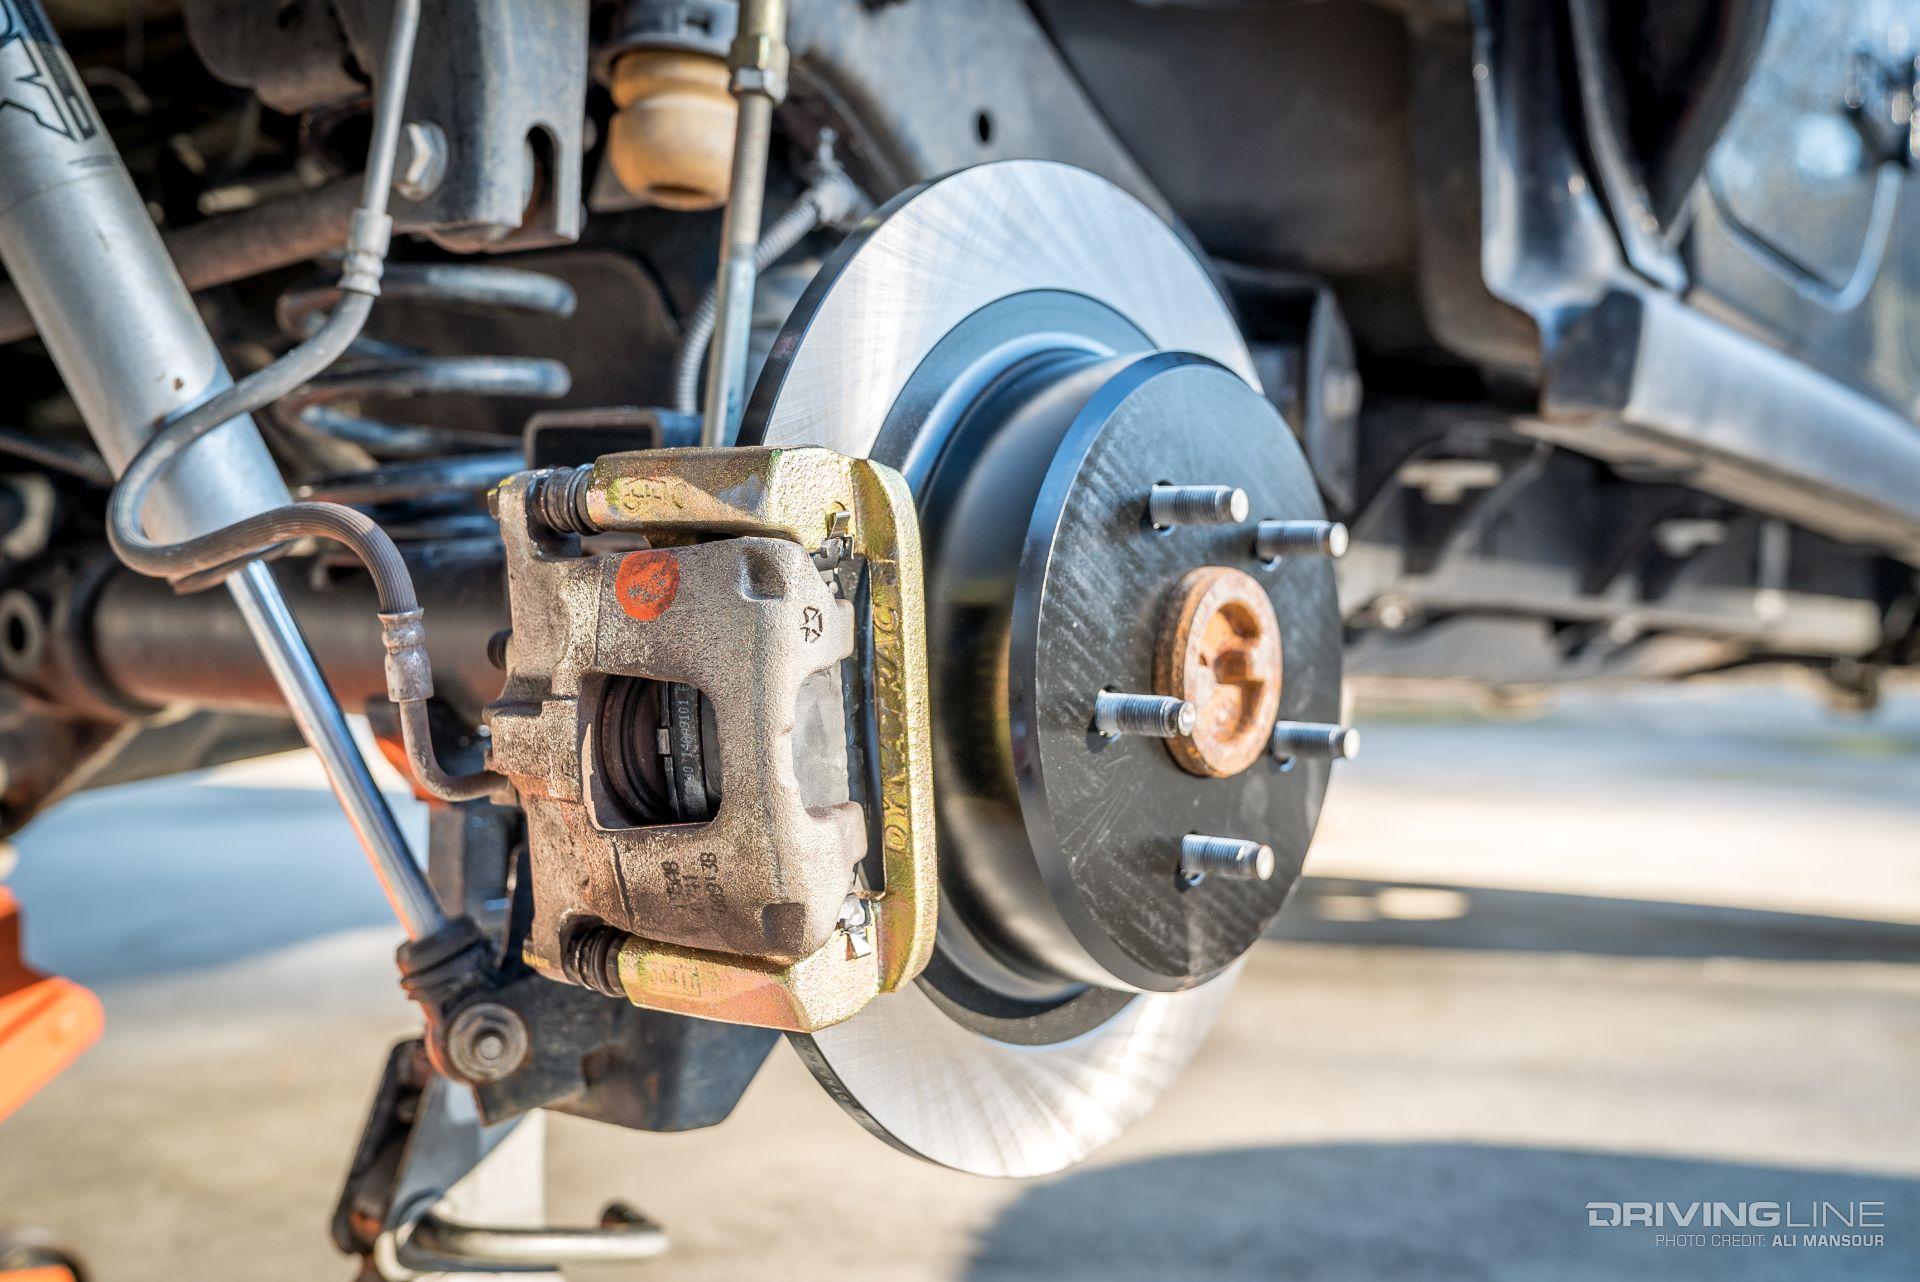 Better JK Brakes for Less: Dynatrac ProGrip Review | DrivingLine